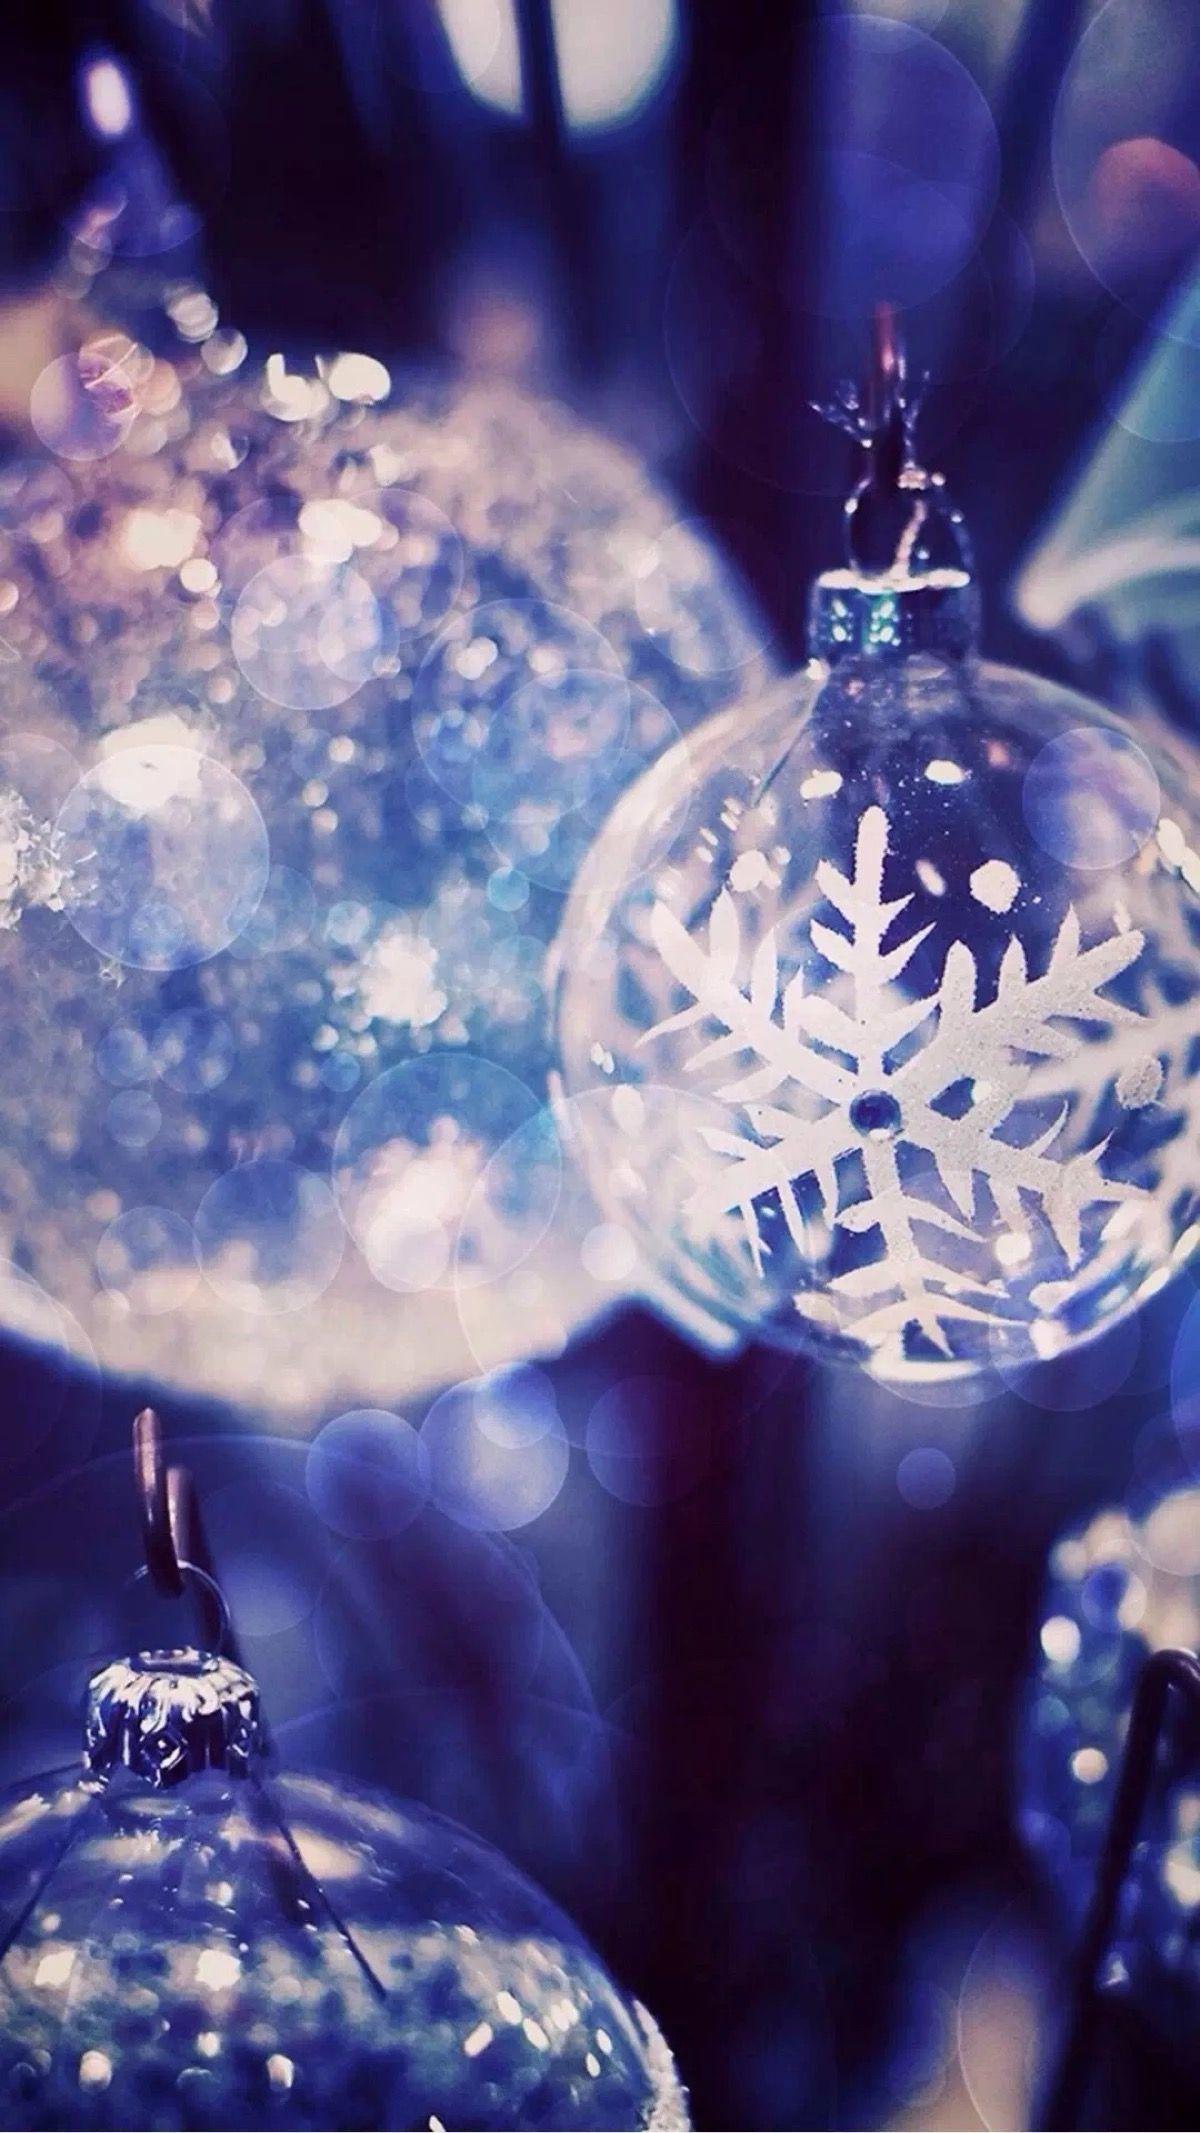 Sfondi Natalizi Per Iphone.Fiocchi Di Neve Sulle Palline Di Natale Sfondo Natalizio Sfondi Iphone Sfondo Iphone